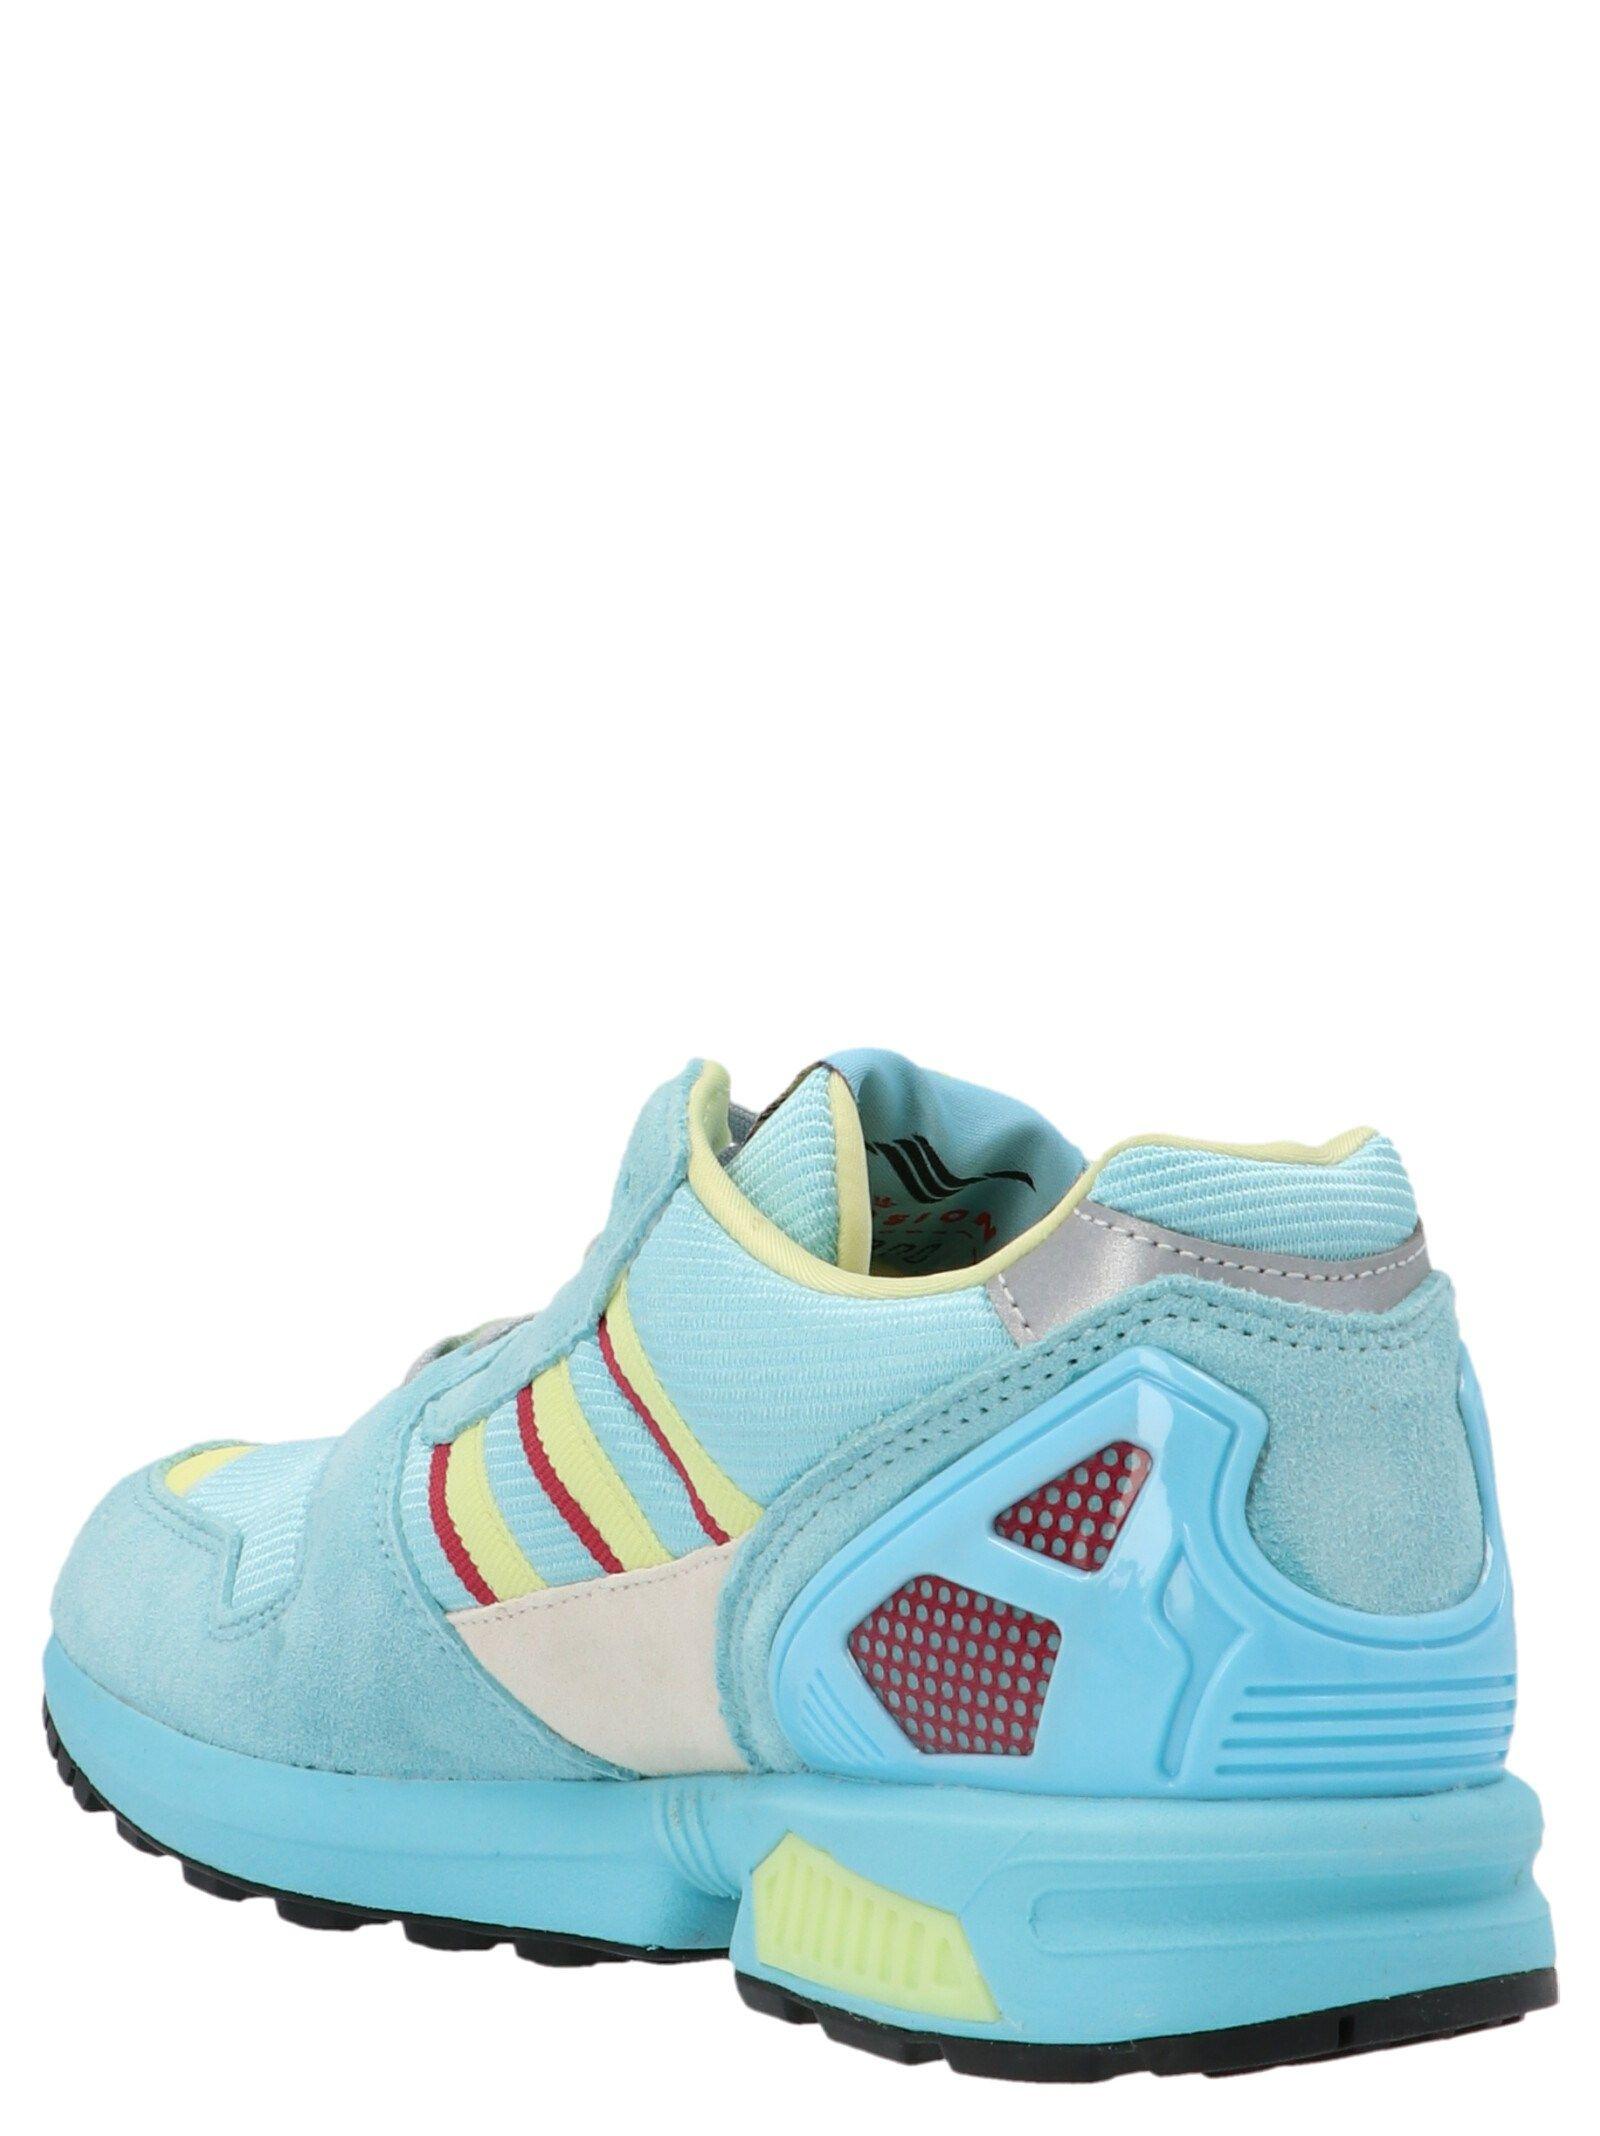 ADIDAS ORIGINALS Sneakers ADIDAS MEN'S MULTICOLOR OTHER MATERIALS SNEAKERS